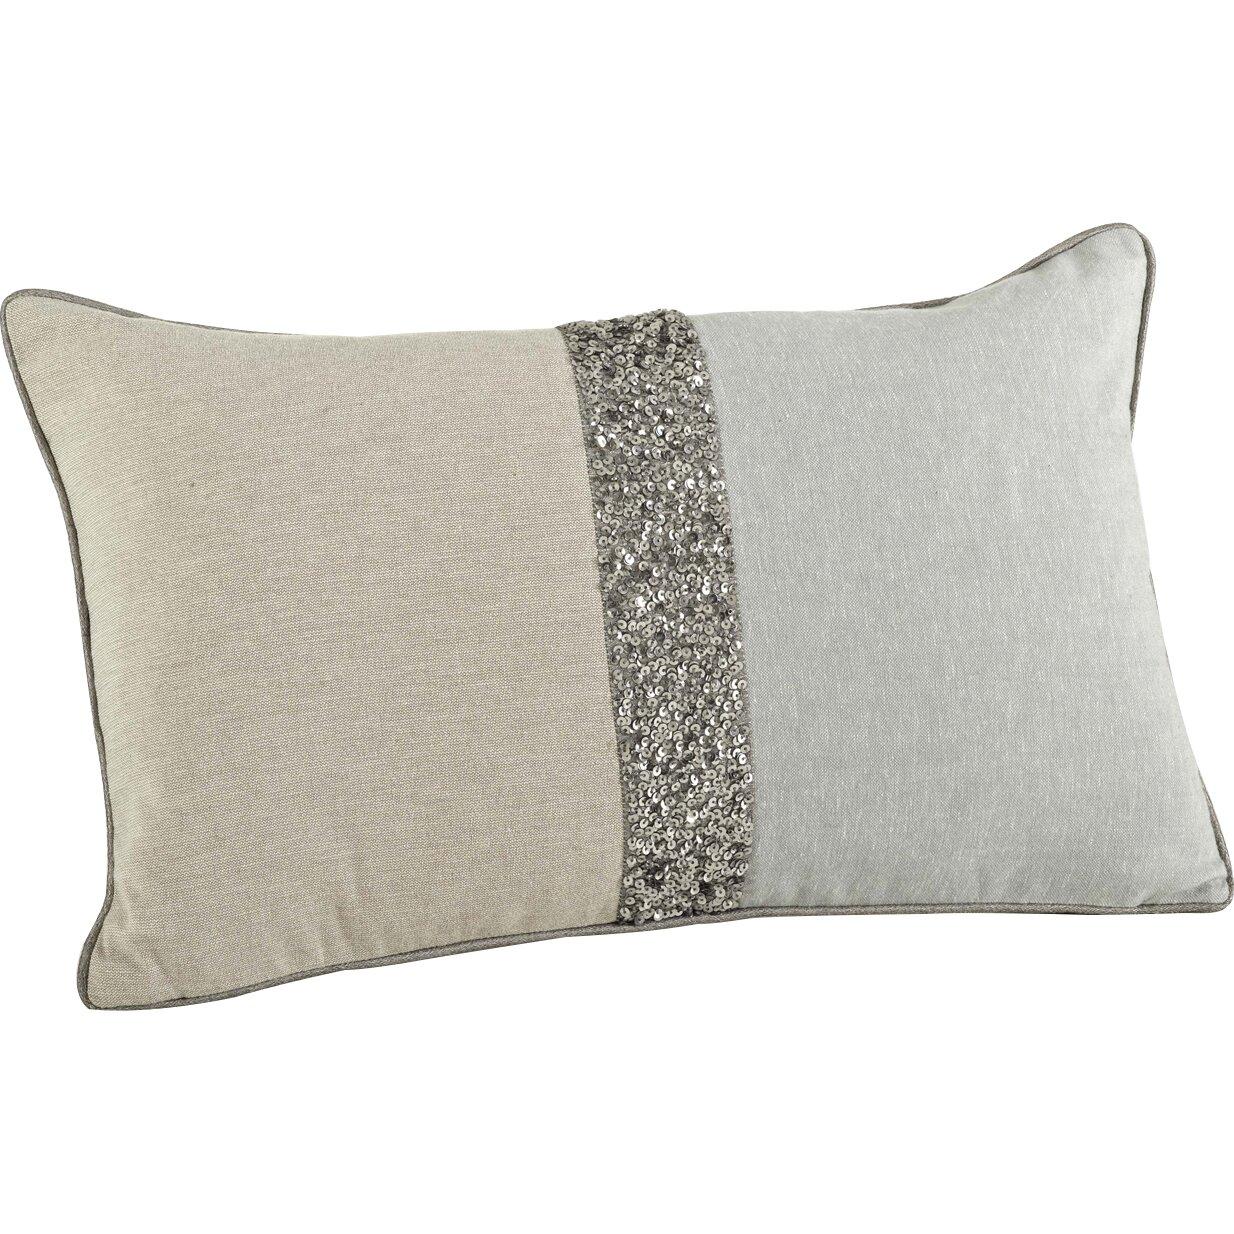 Saro The Posh 2 Tone Beaded Cotton Throw Pillow & Reviews Wayfair